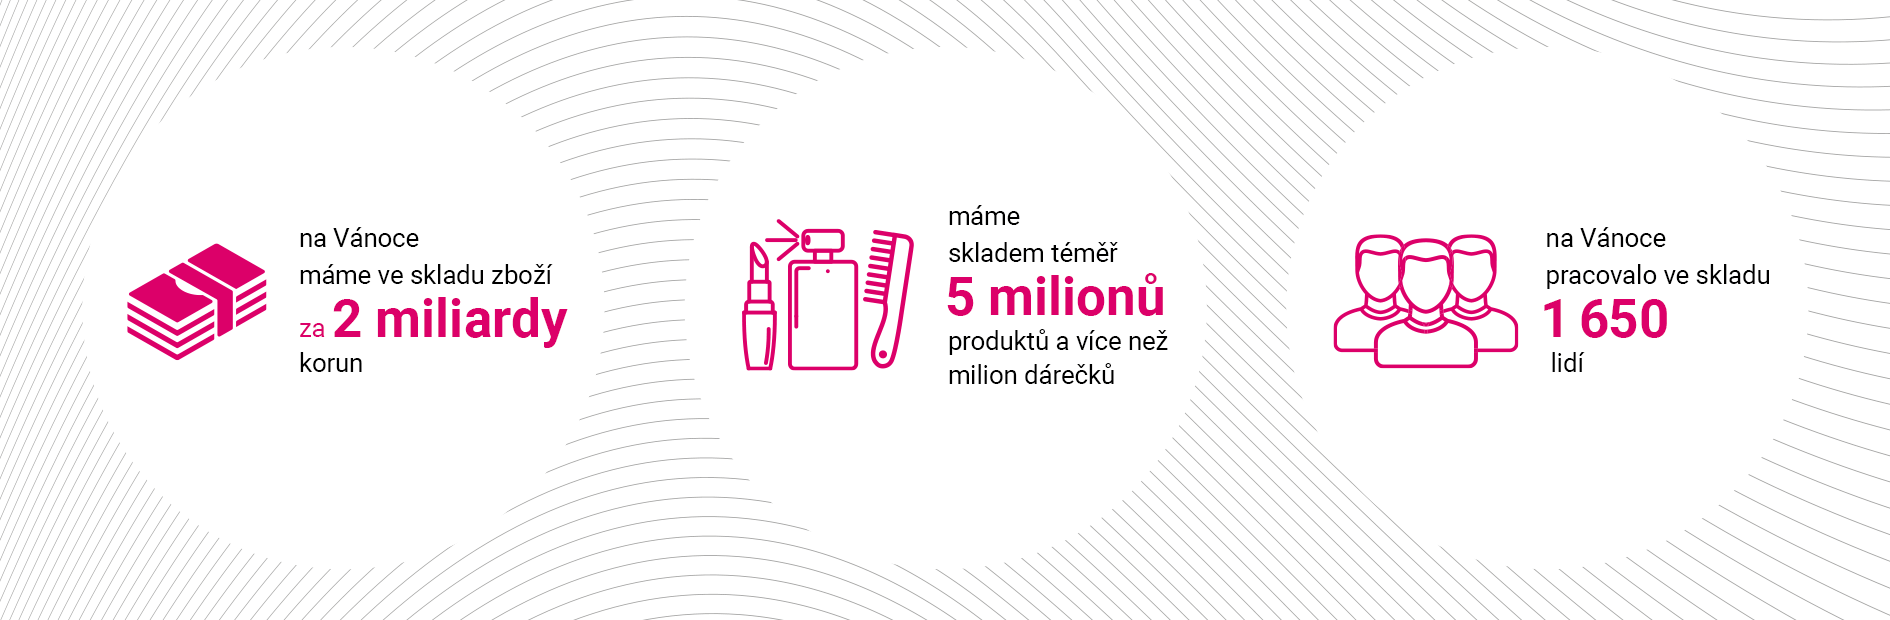 5 milionů produktů skladem